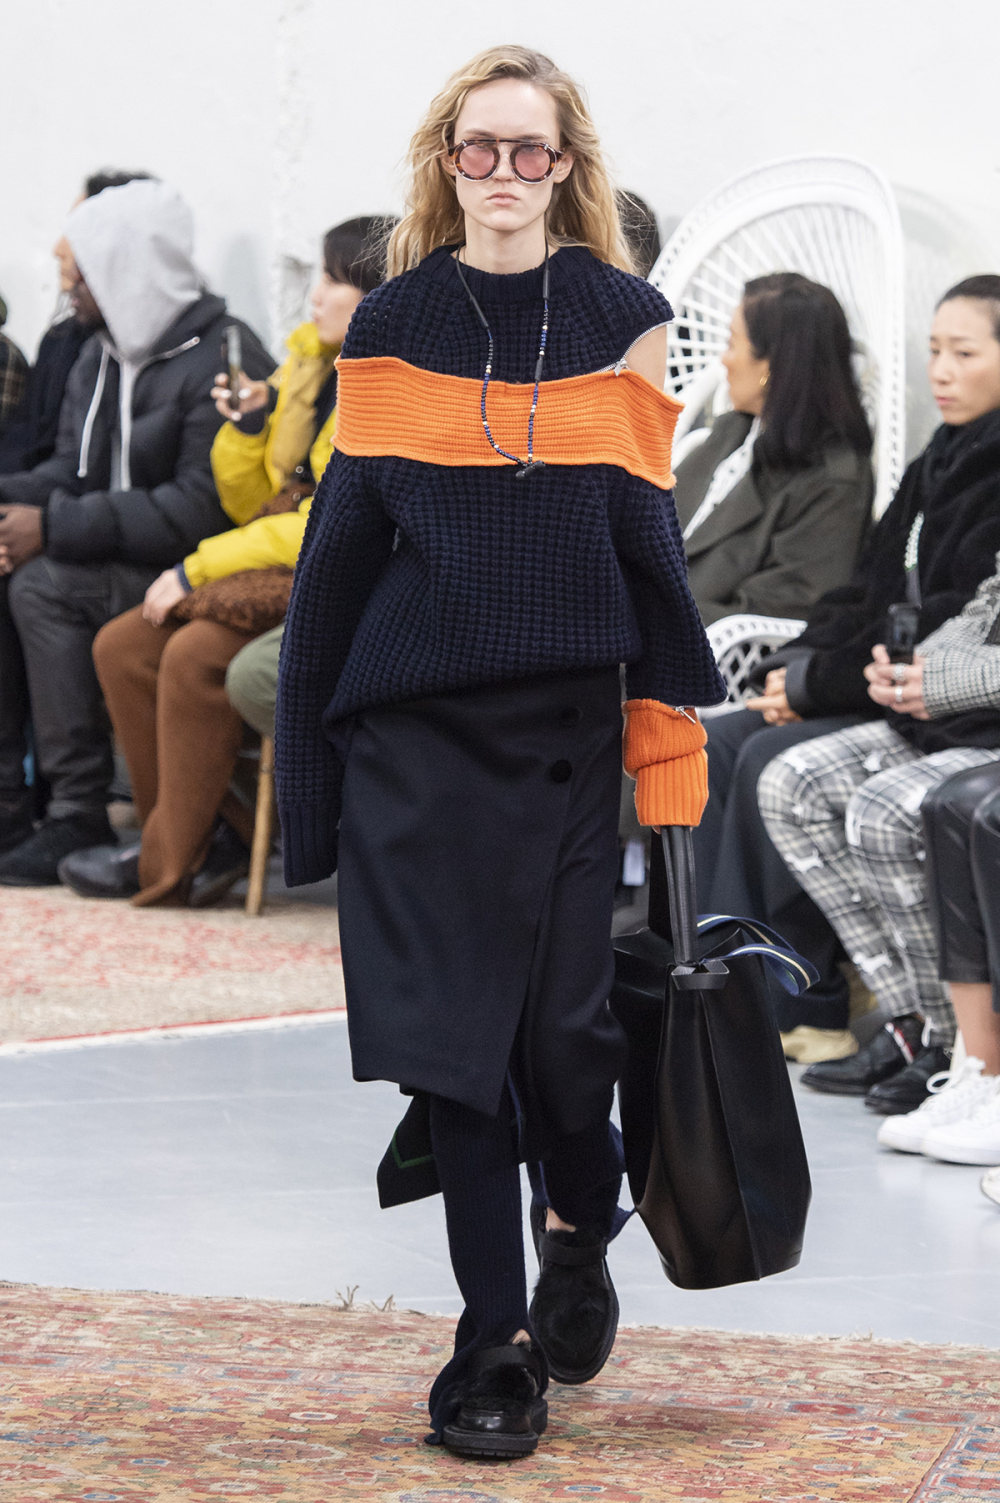 Sacai时装系列超大号黑色圆领毛衣和长款绿色北欧毛衣连衣裙-21.jpg